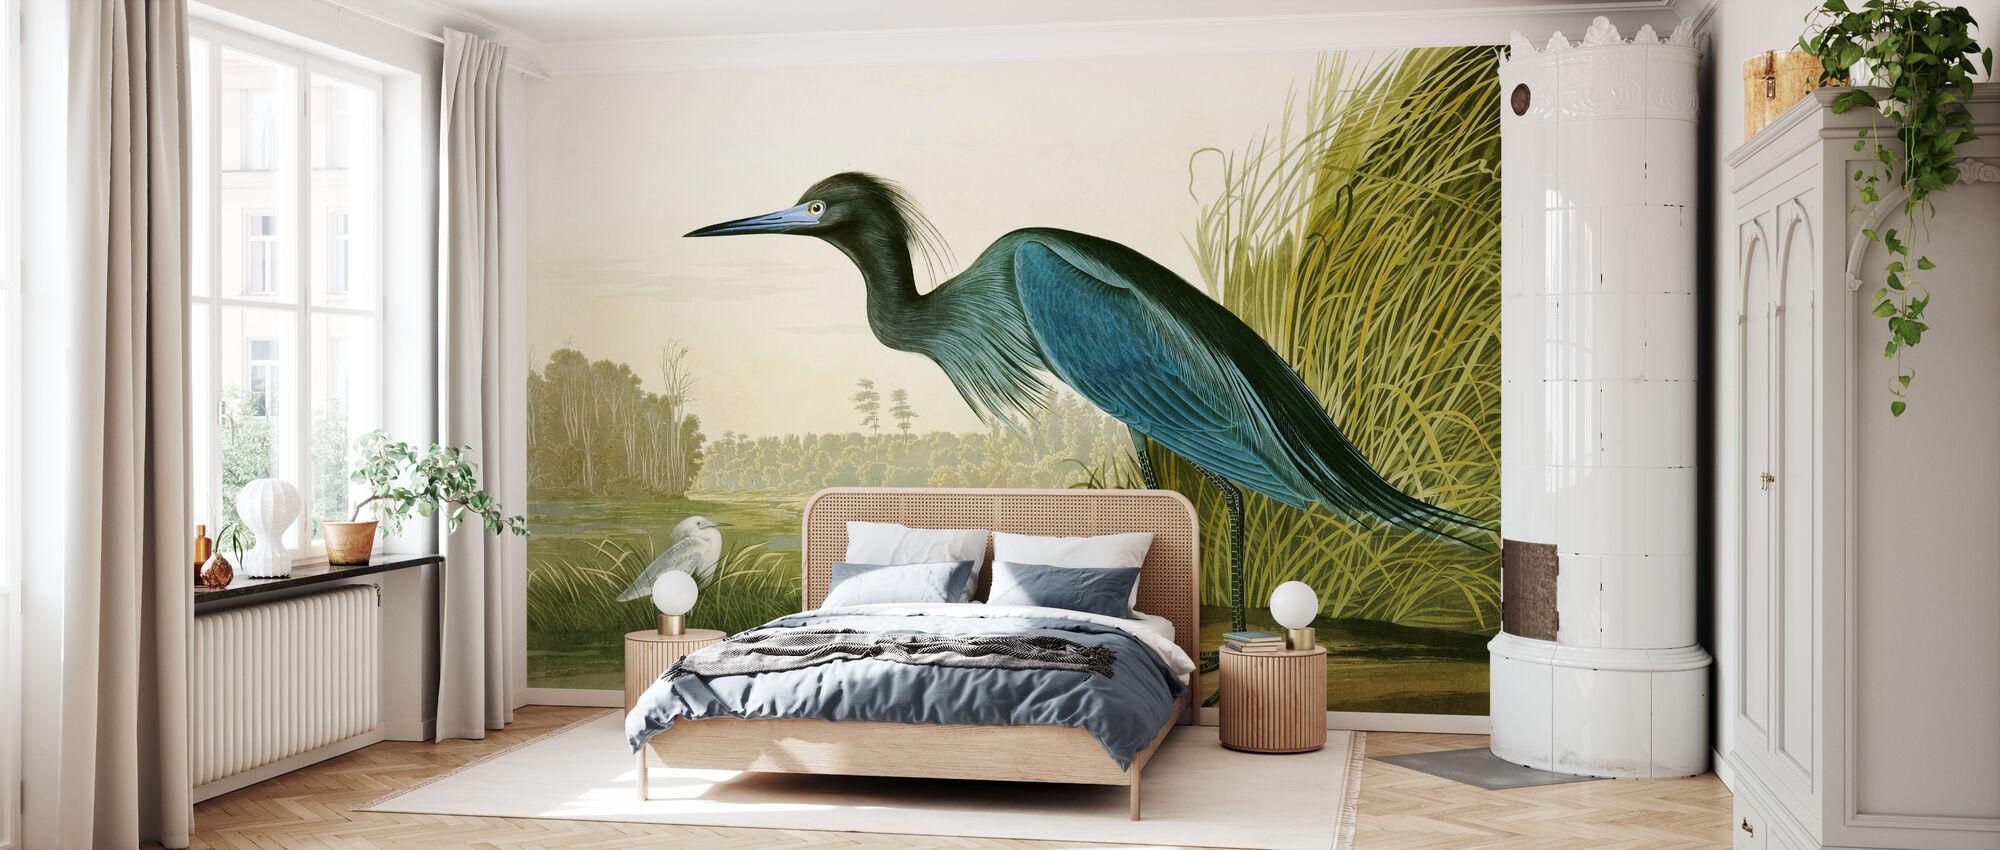 Little Blue Heron - John James Audubon - Wallpaper - Bedroom